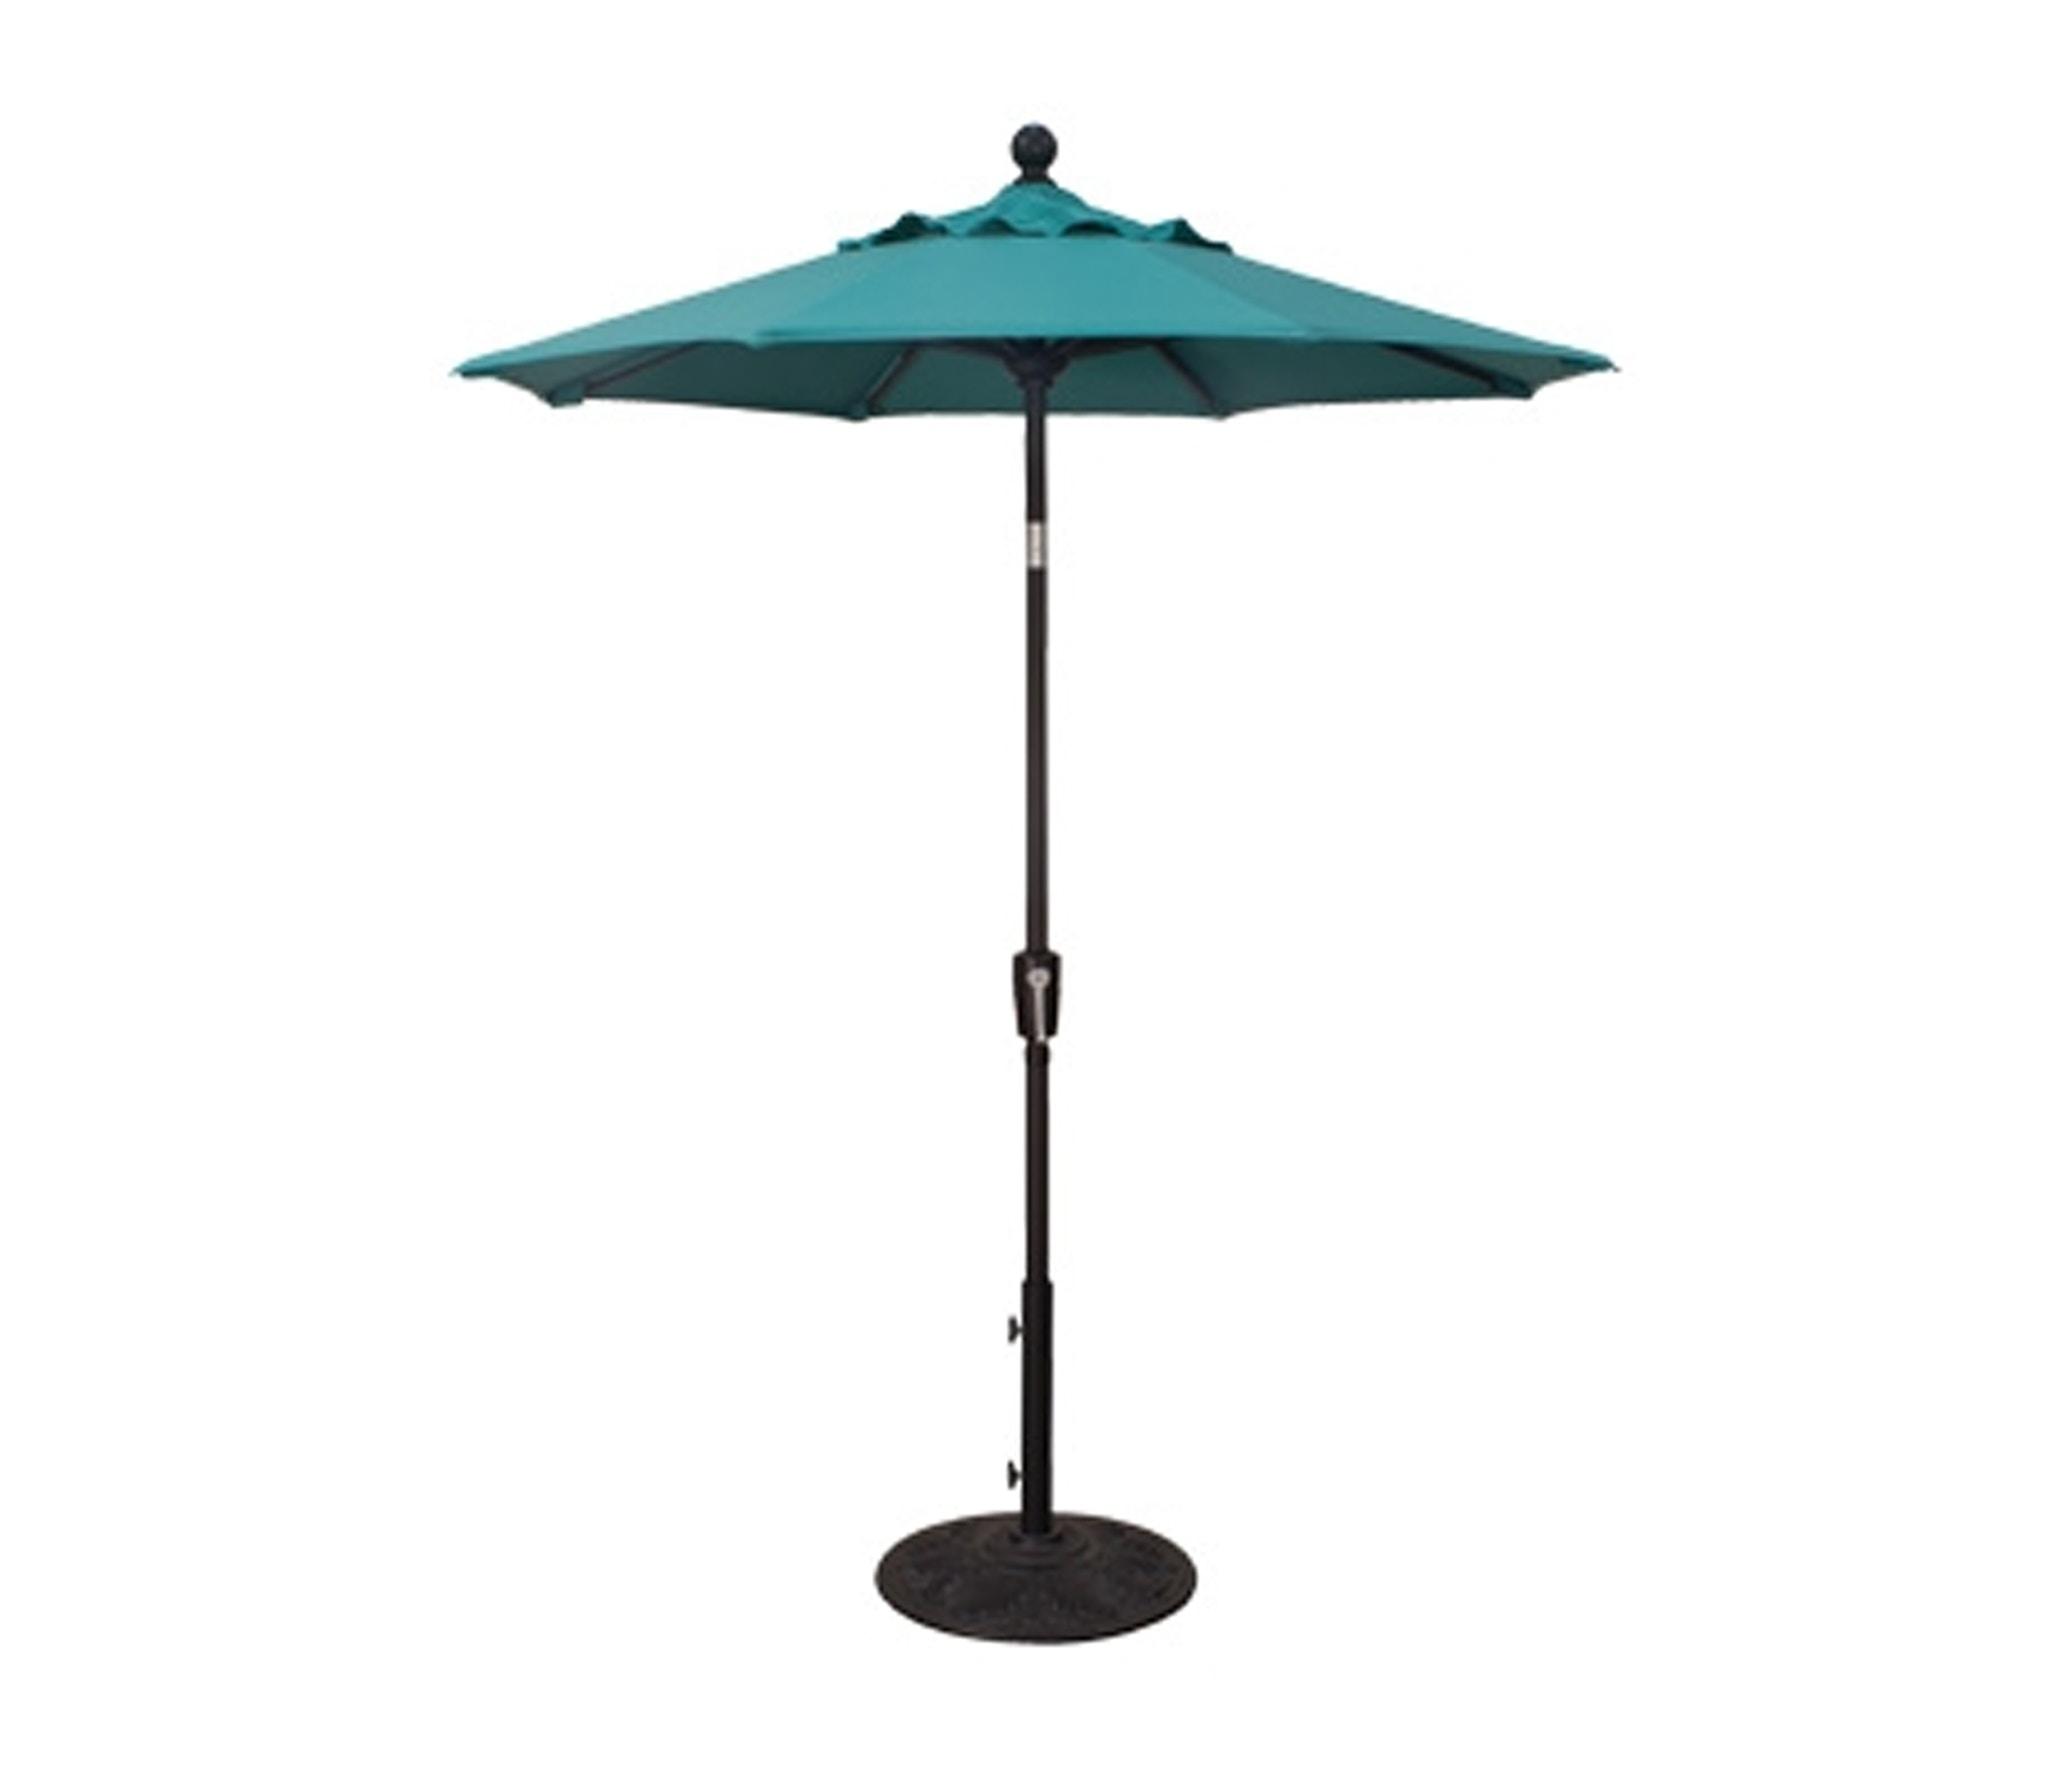 Cabanacoast Furniture 60 Outdoorpatio Patio Umbrella 6 Ft Button Tilt